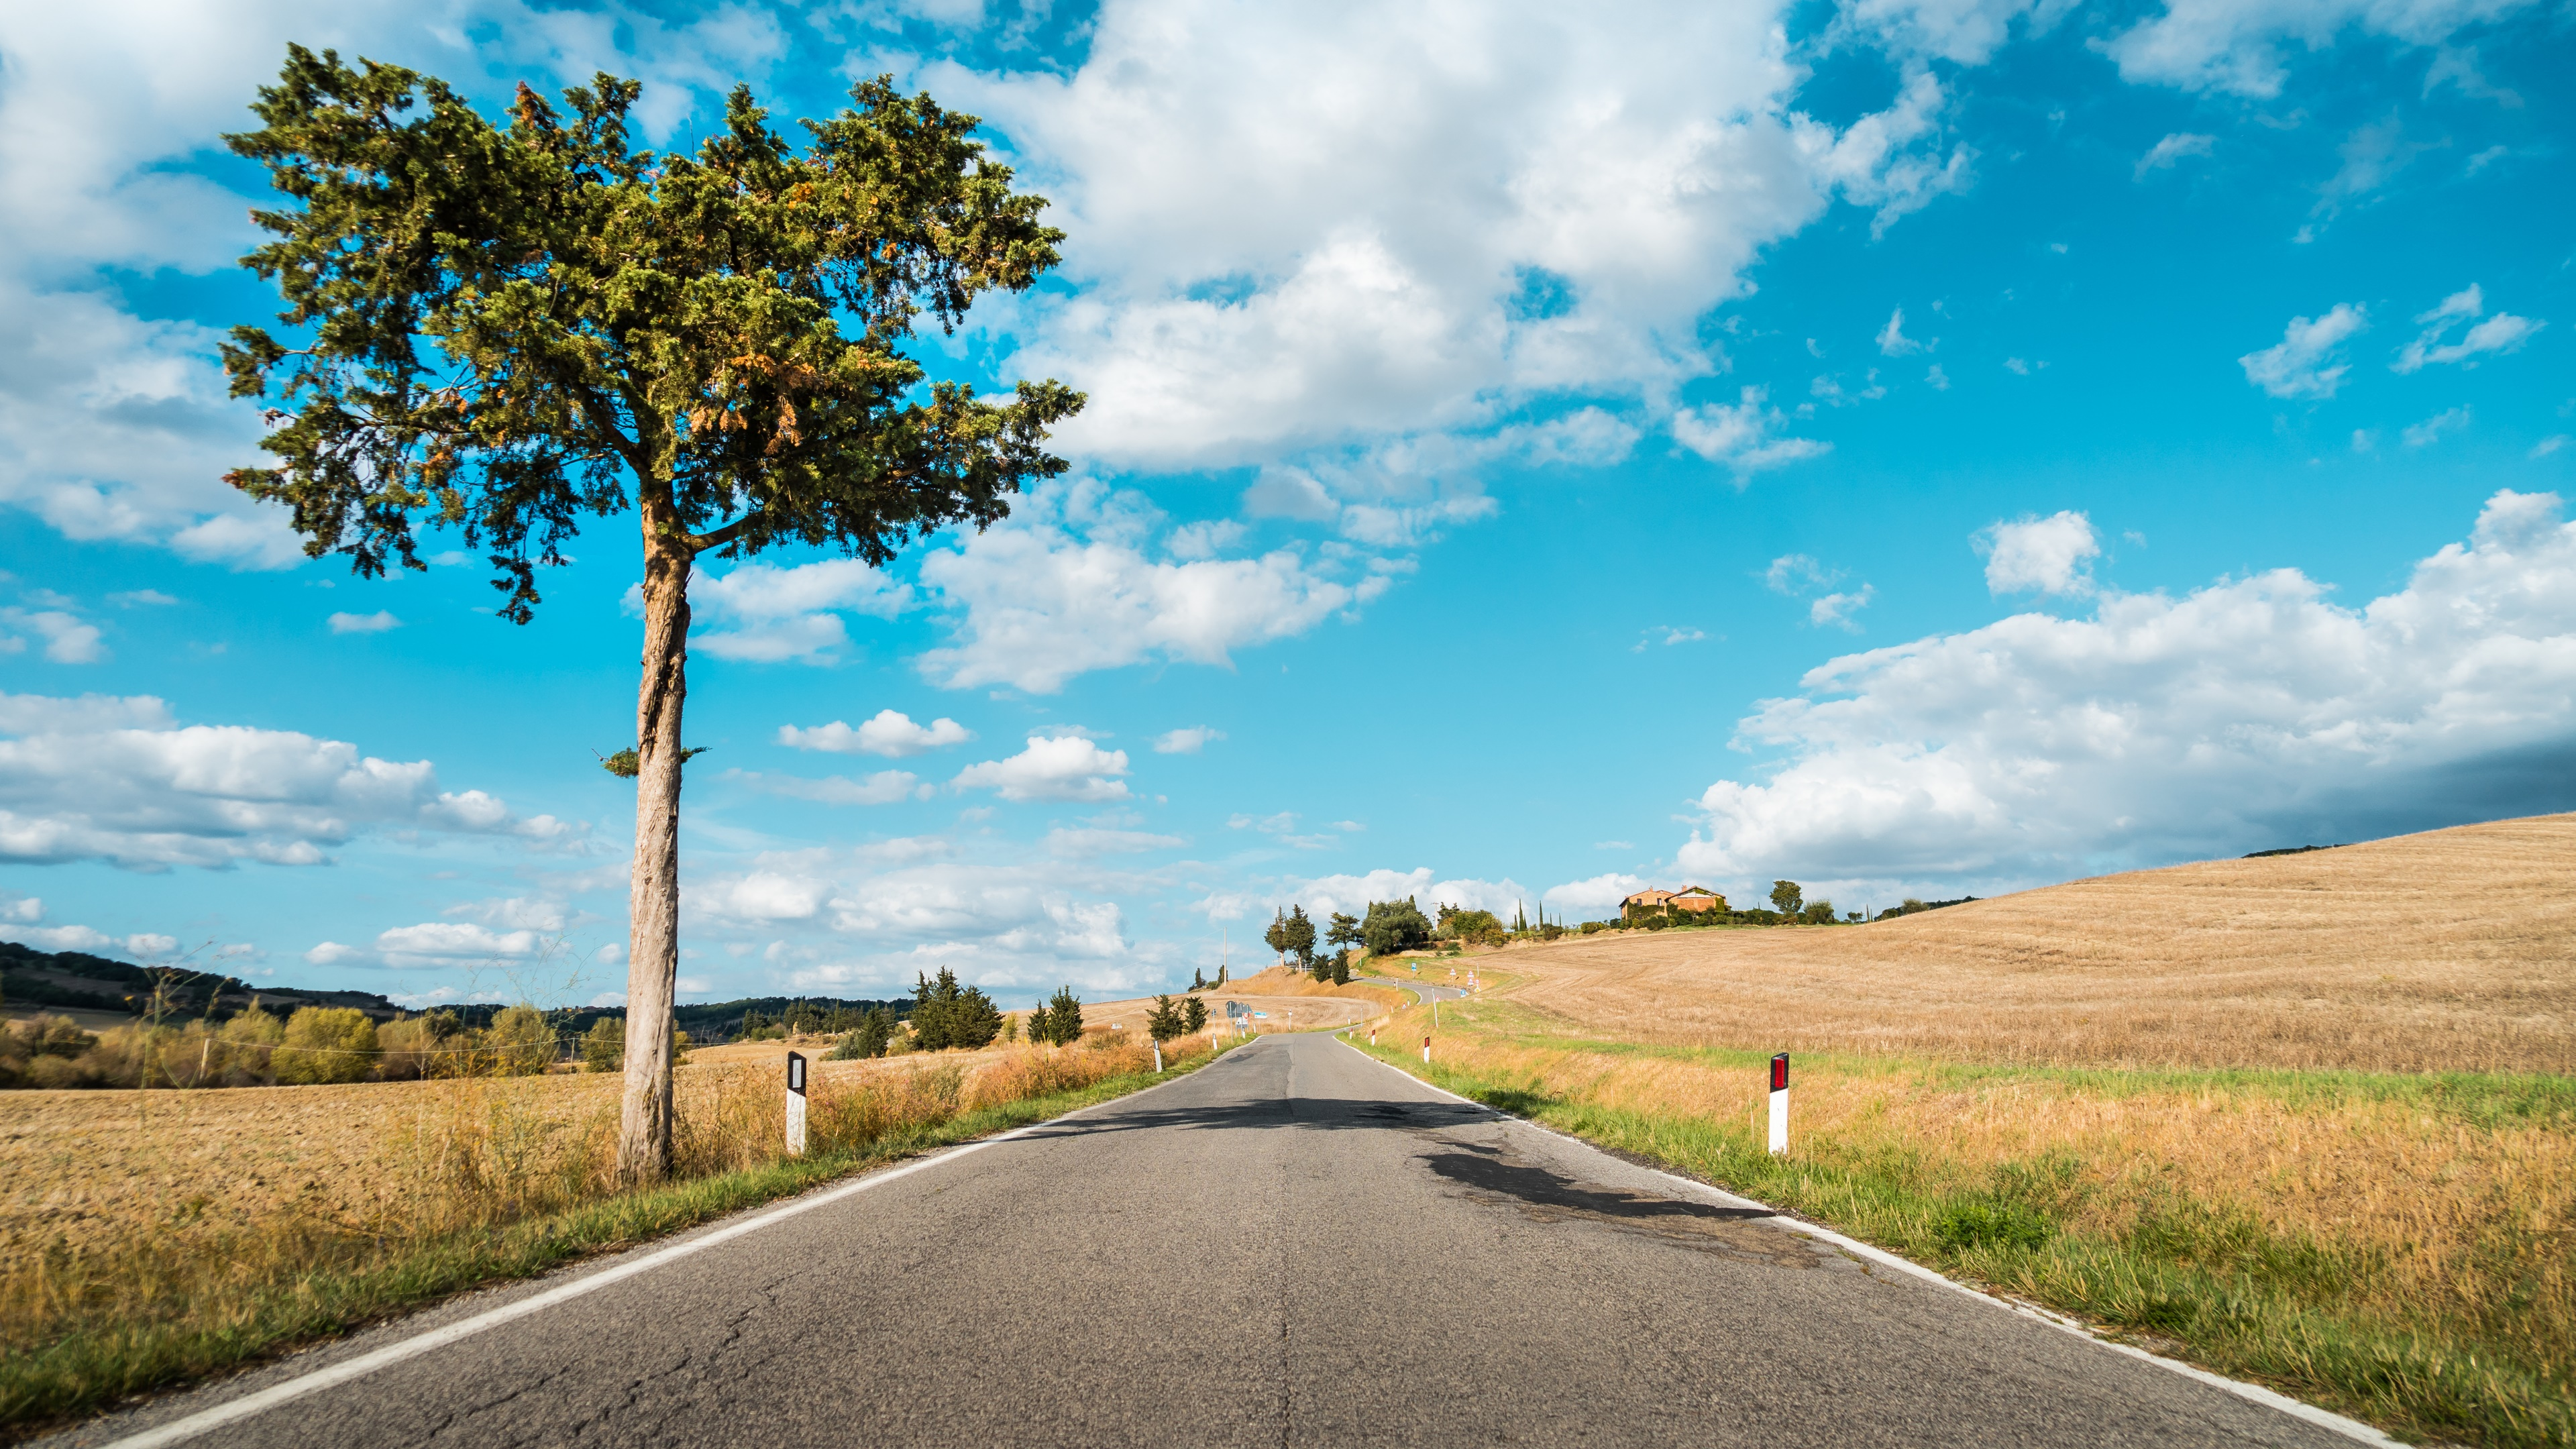 Tuscany road trip wallpaper